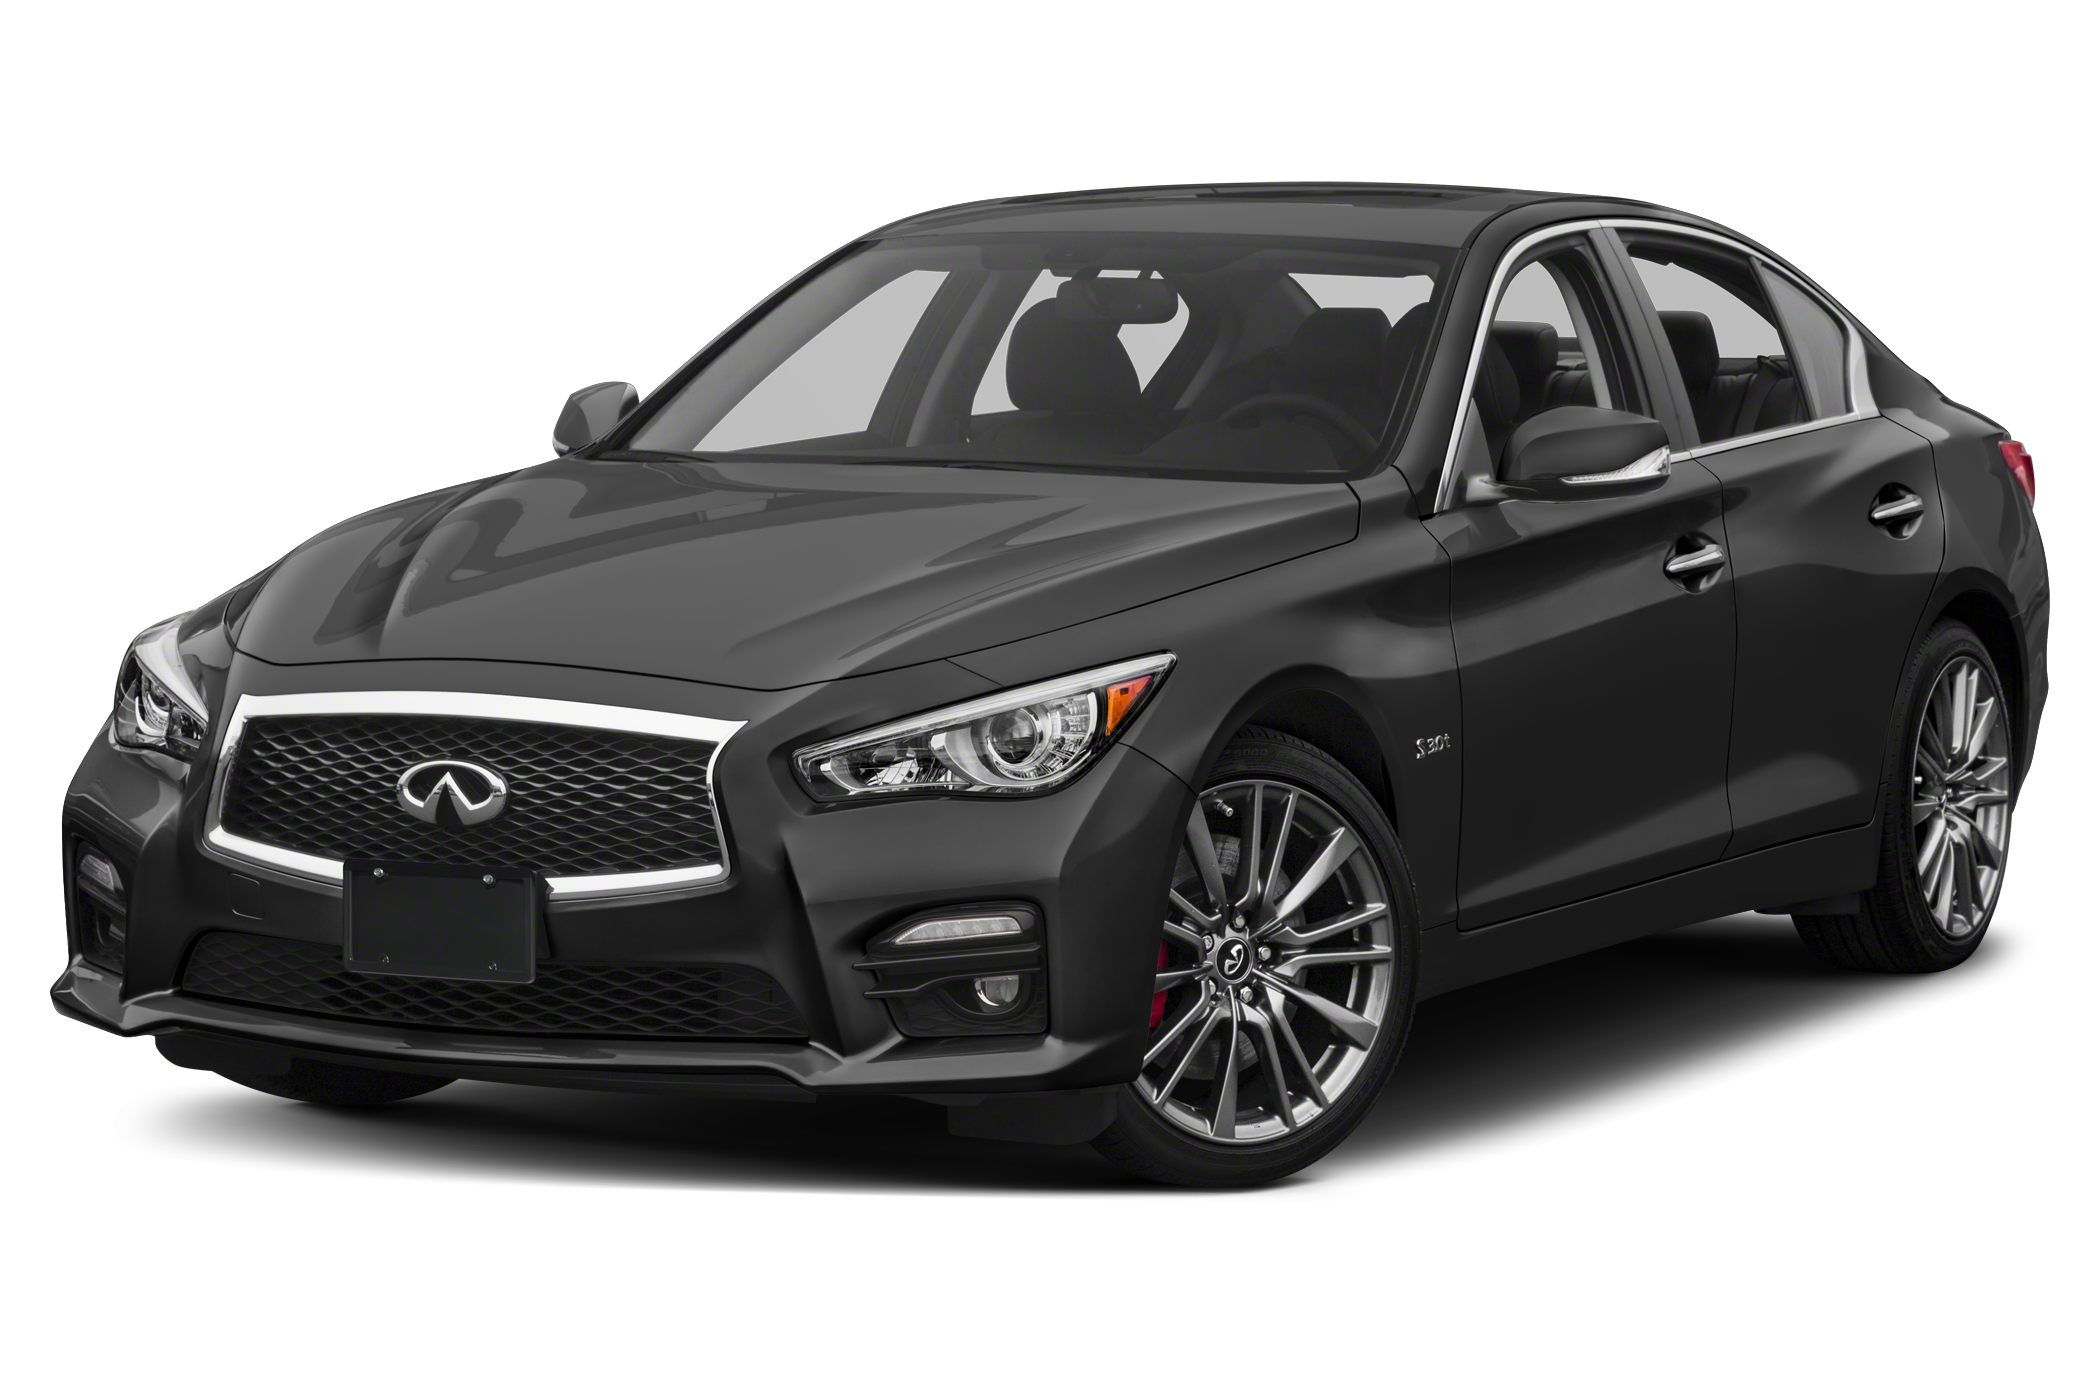 2017 Infiniti Q50 Reviews Specs And Prices Cars Com